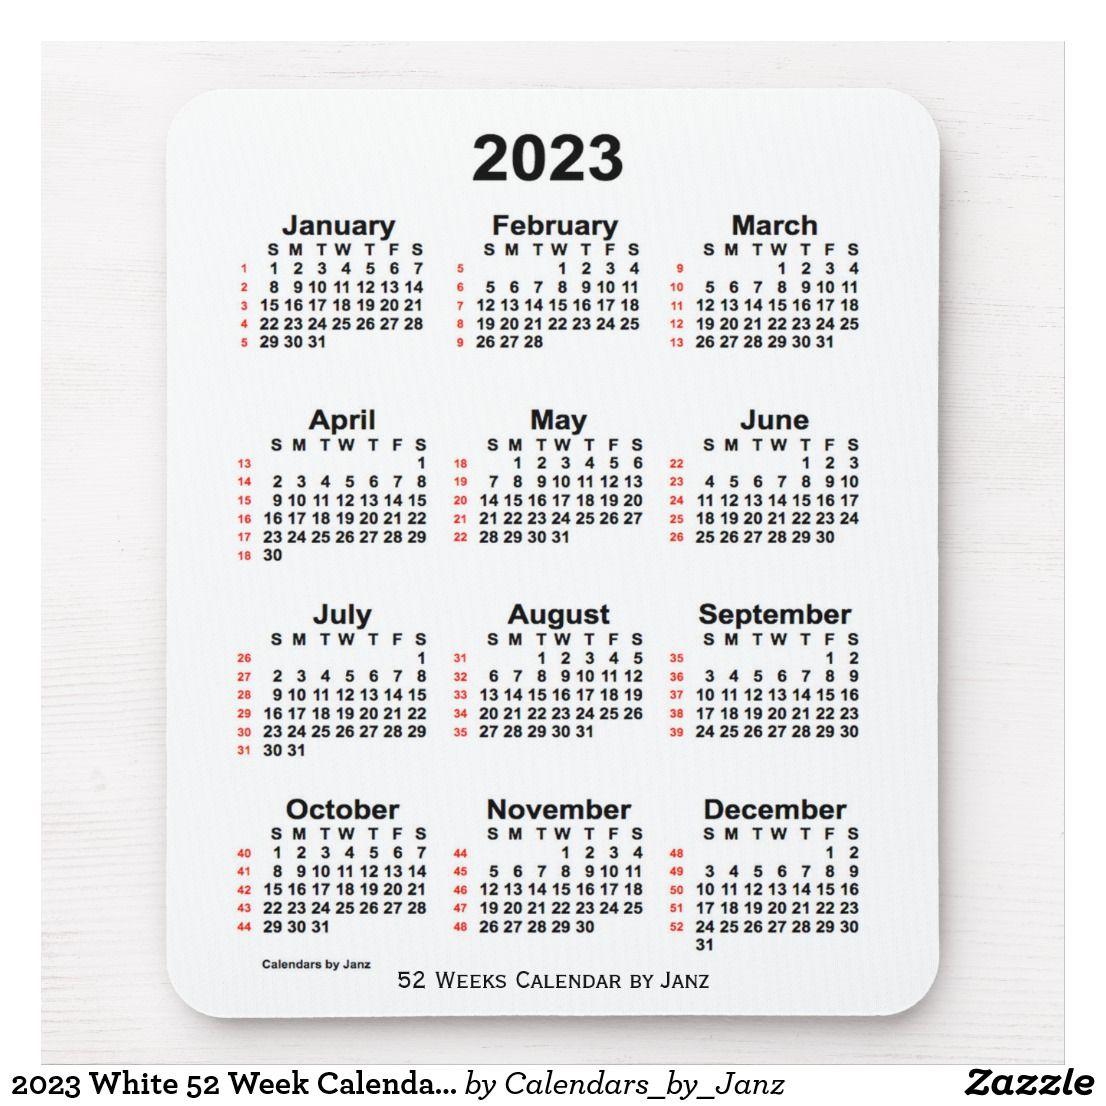 2023 White 52 Week Calendar By Janz Mouse Pad Zazzle Com